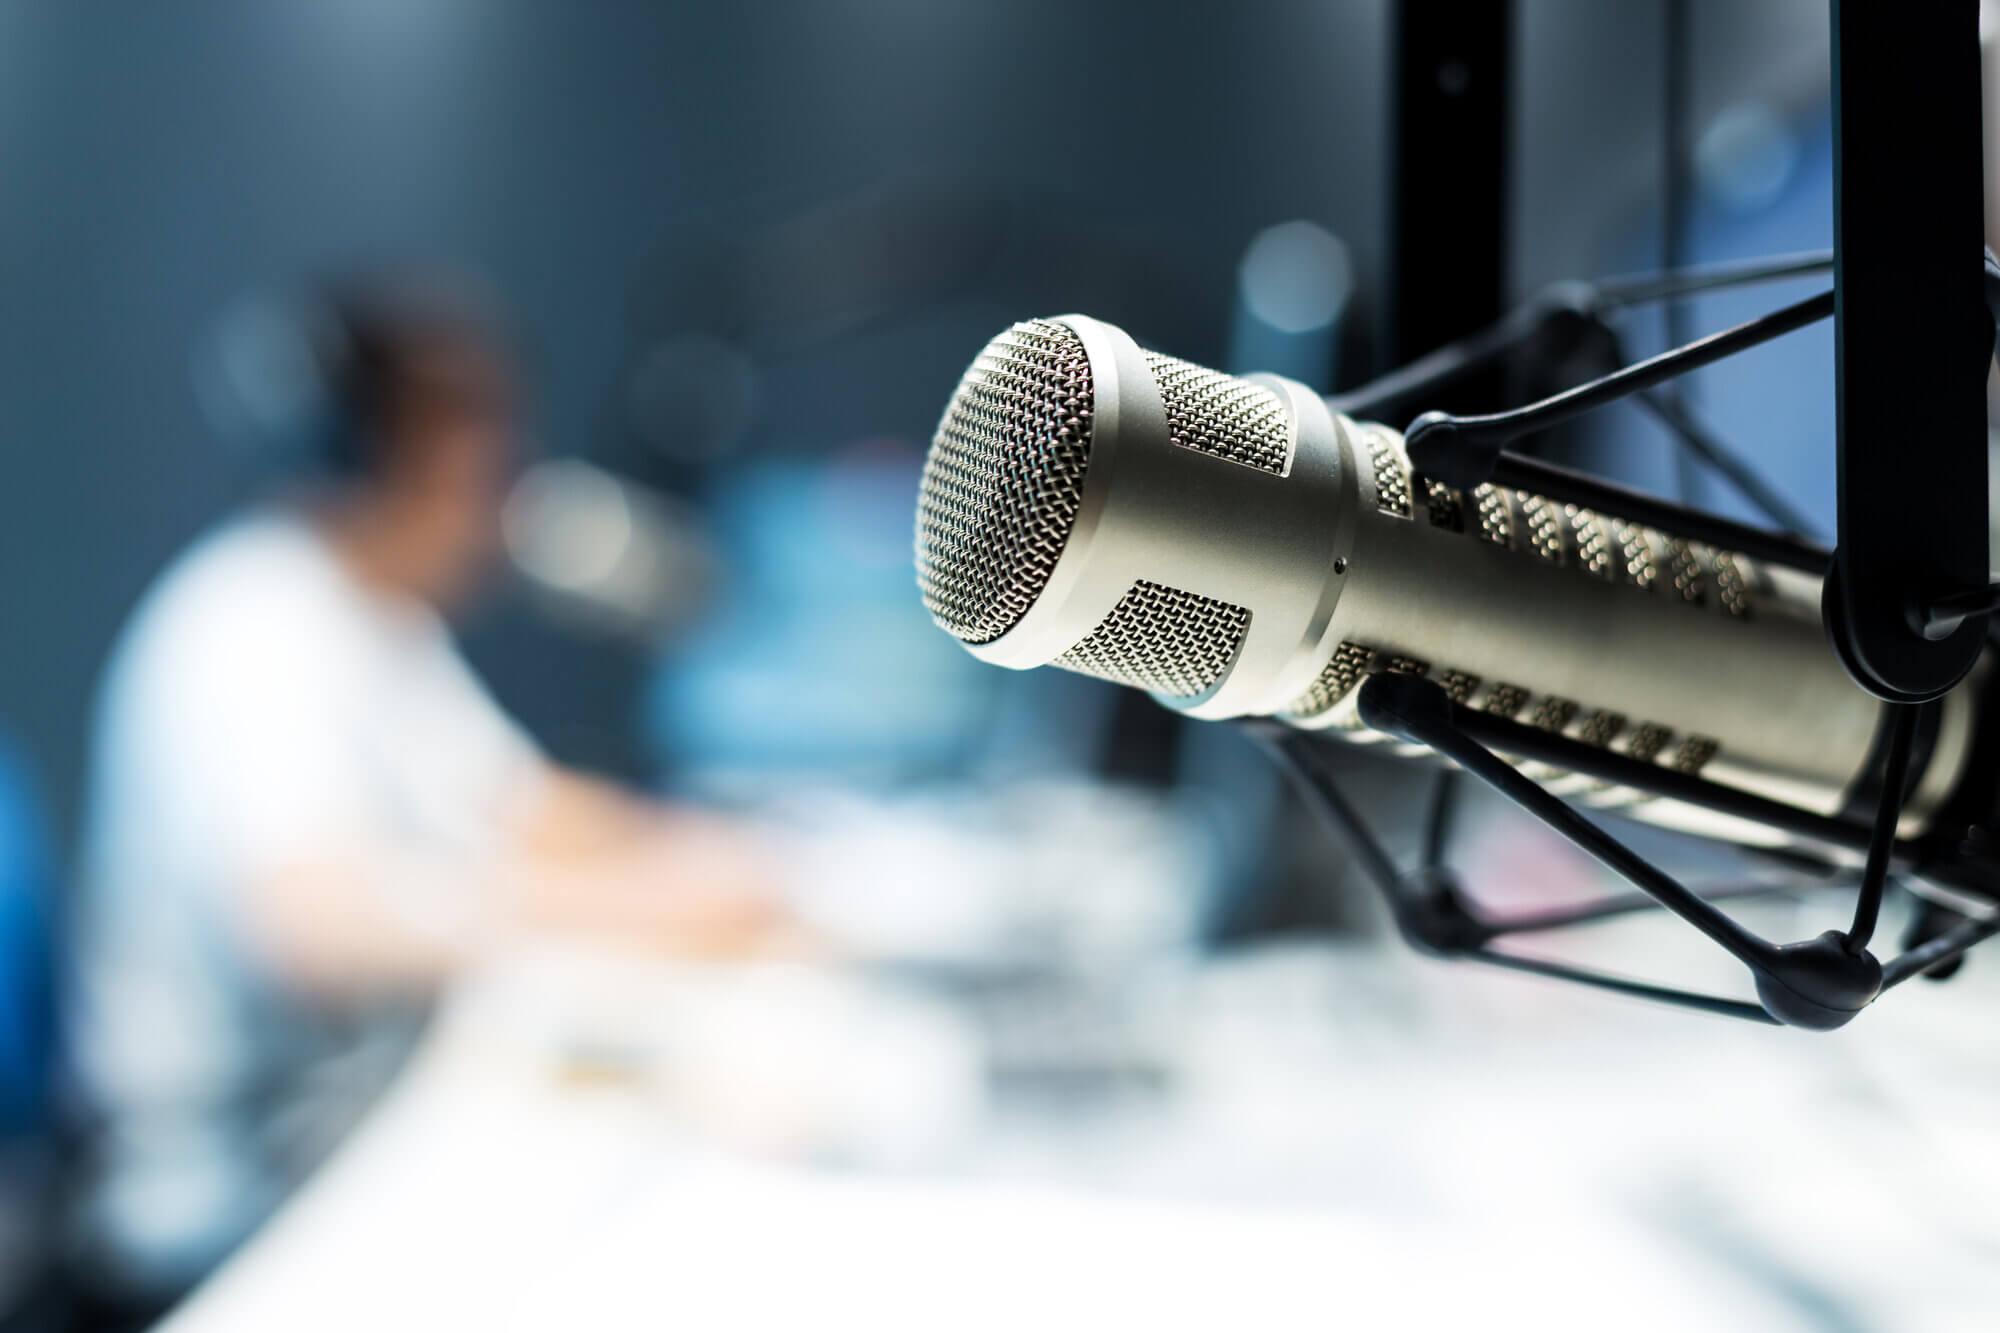 young man dj works in modern broadcast studio